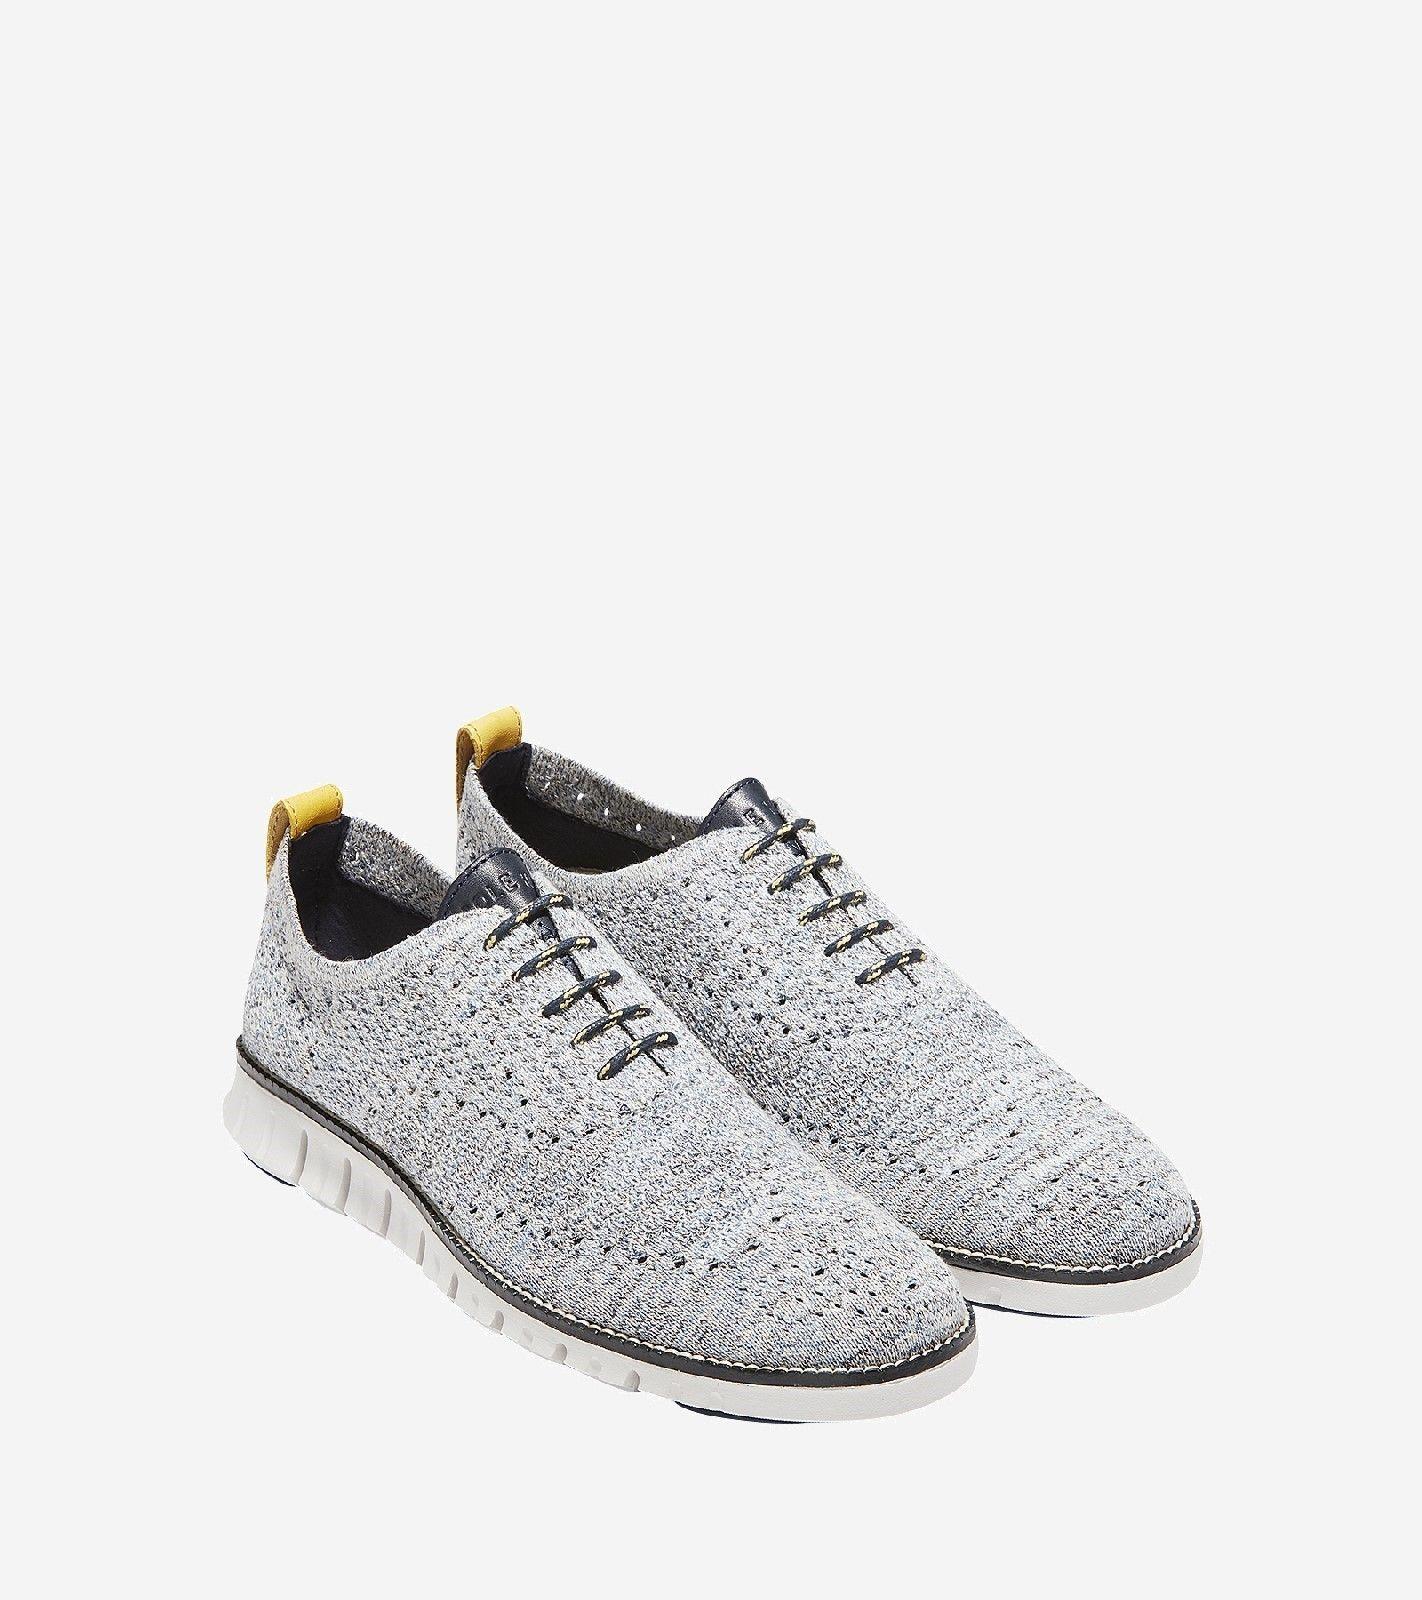 ZEROGRAND Stitchlite Oxford Lace UP Shoe